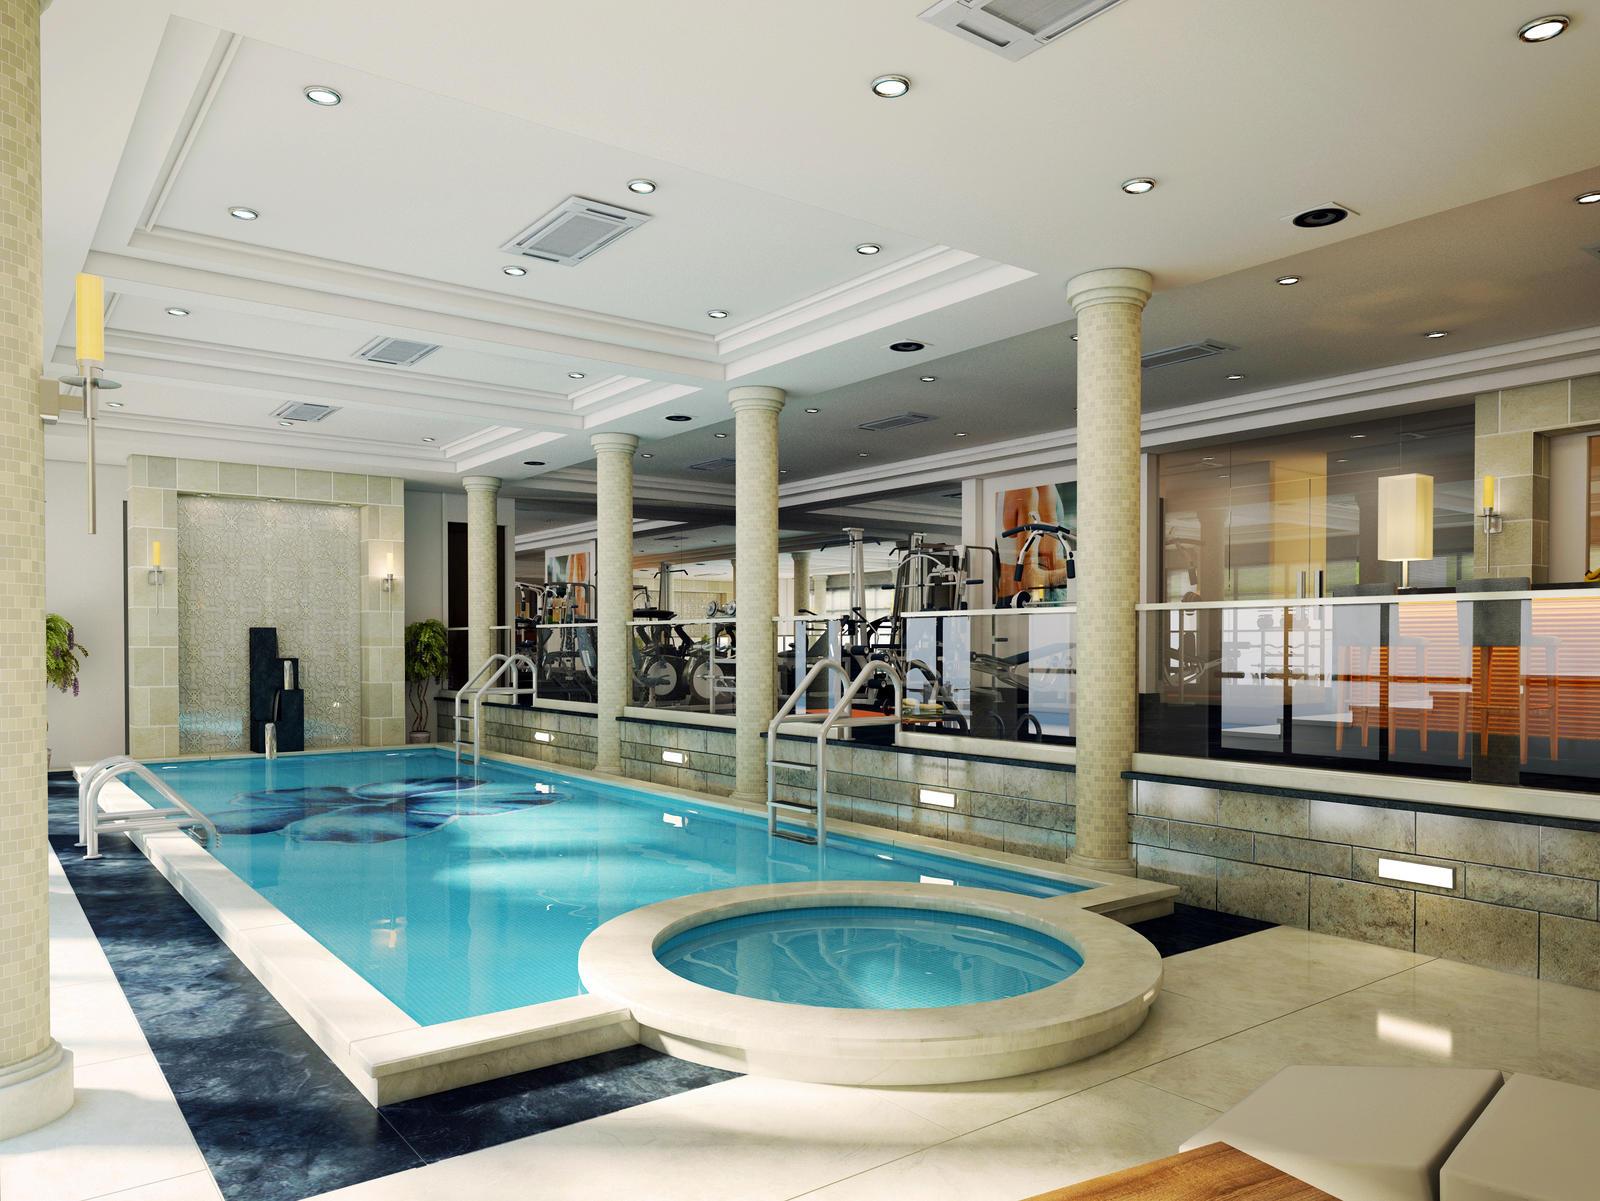 Home Designer Interiors 2015 Uk Basement Pool 2 By Kasrawy On Deviantart